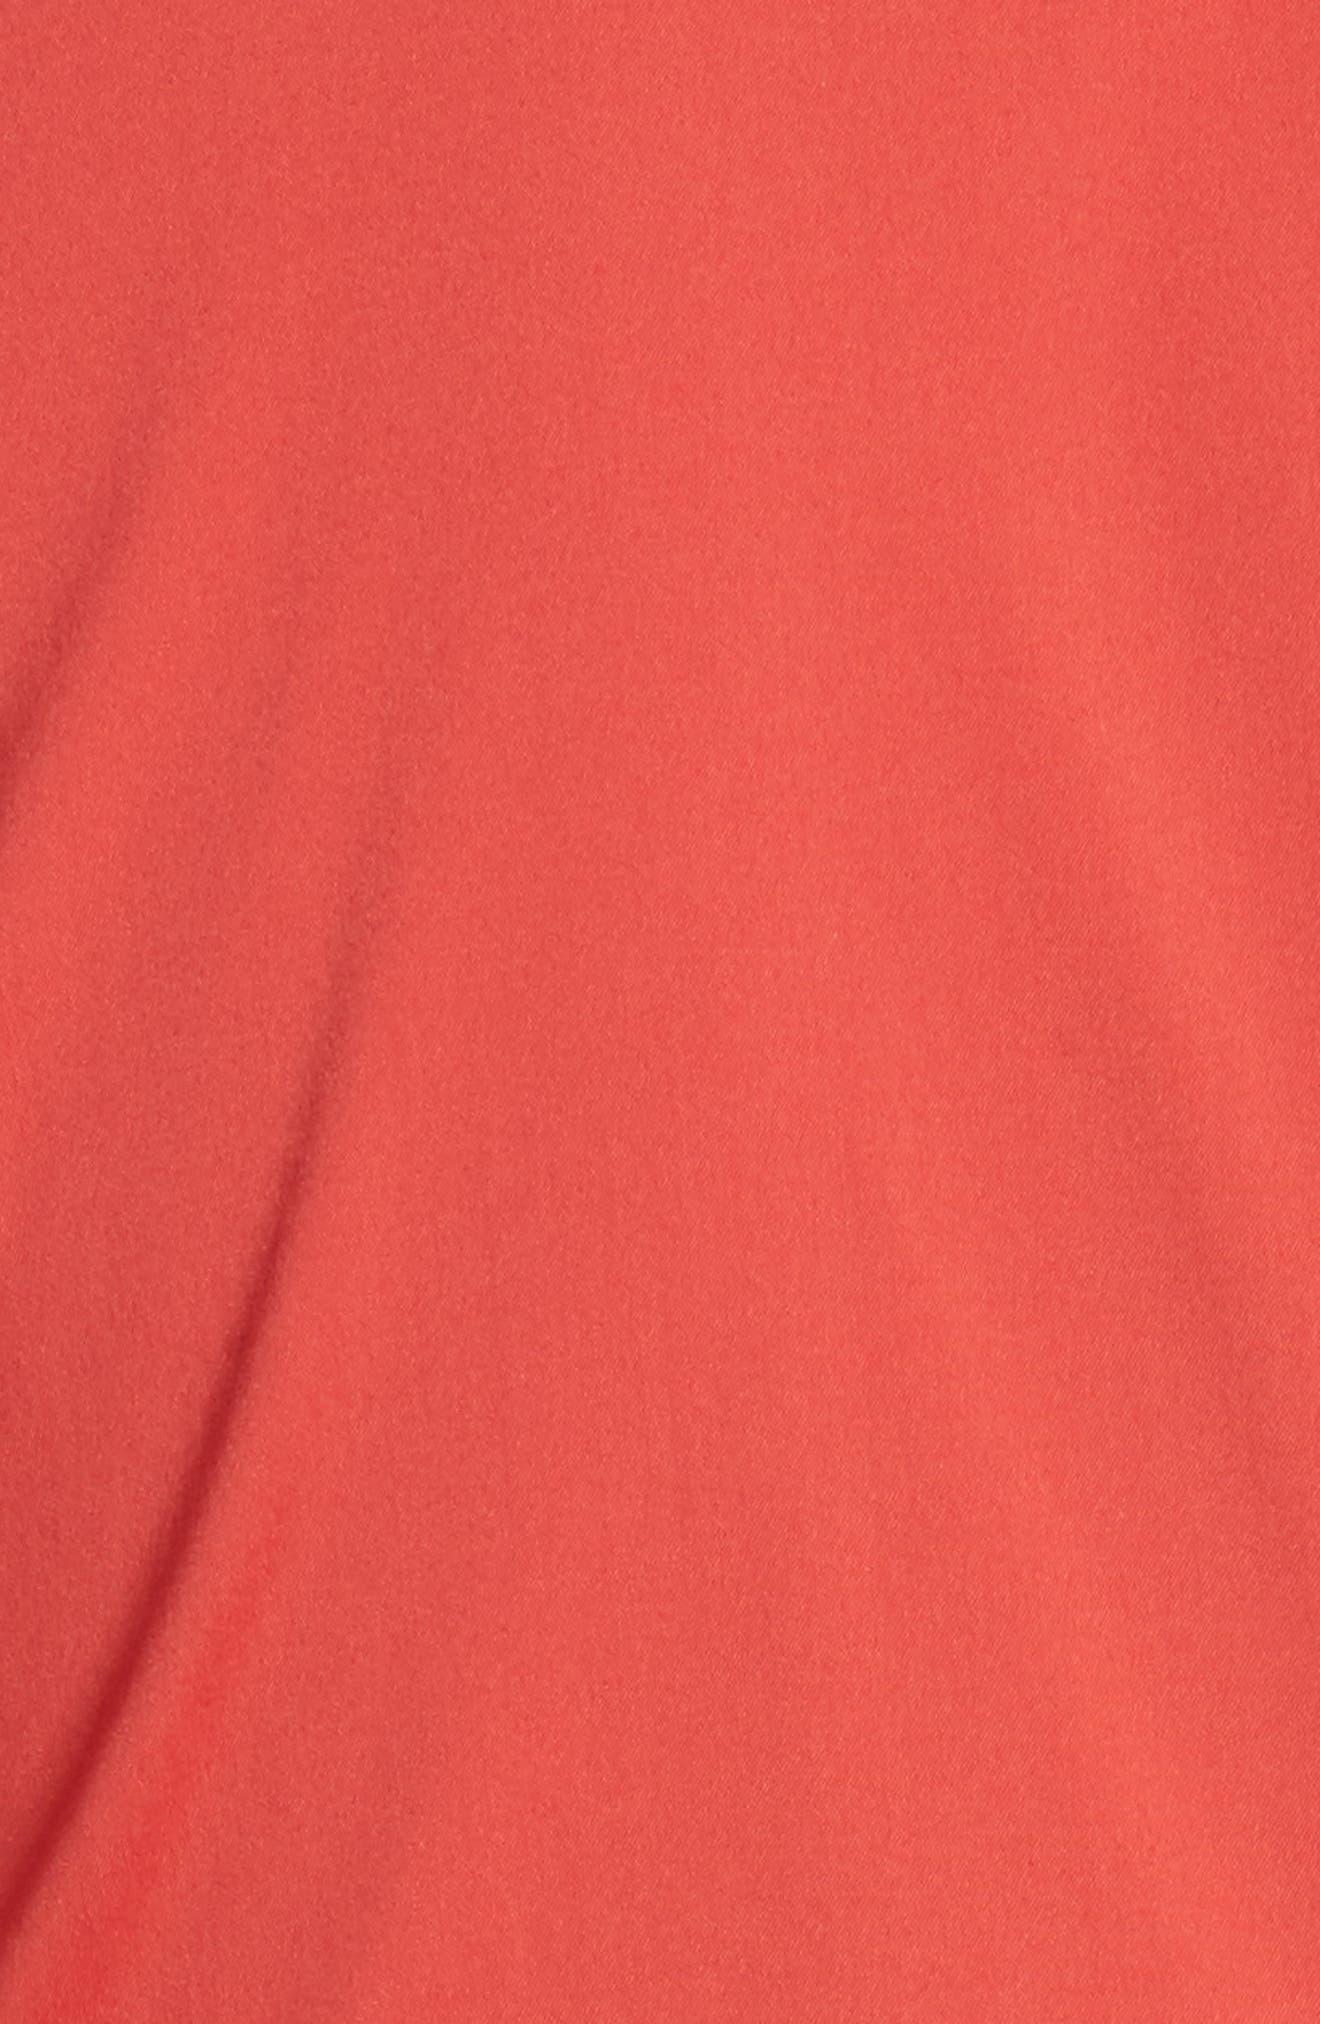 Mariel Knotted Shirtdress,                             Alternate thumbnail 6, color,                             Salsa